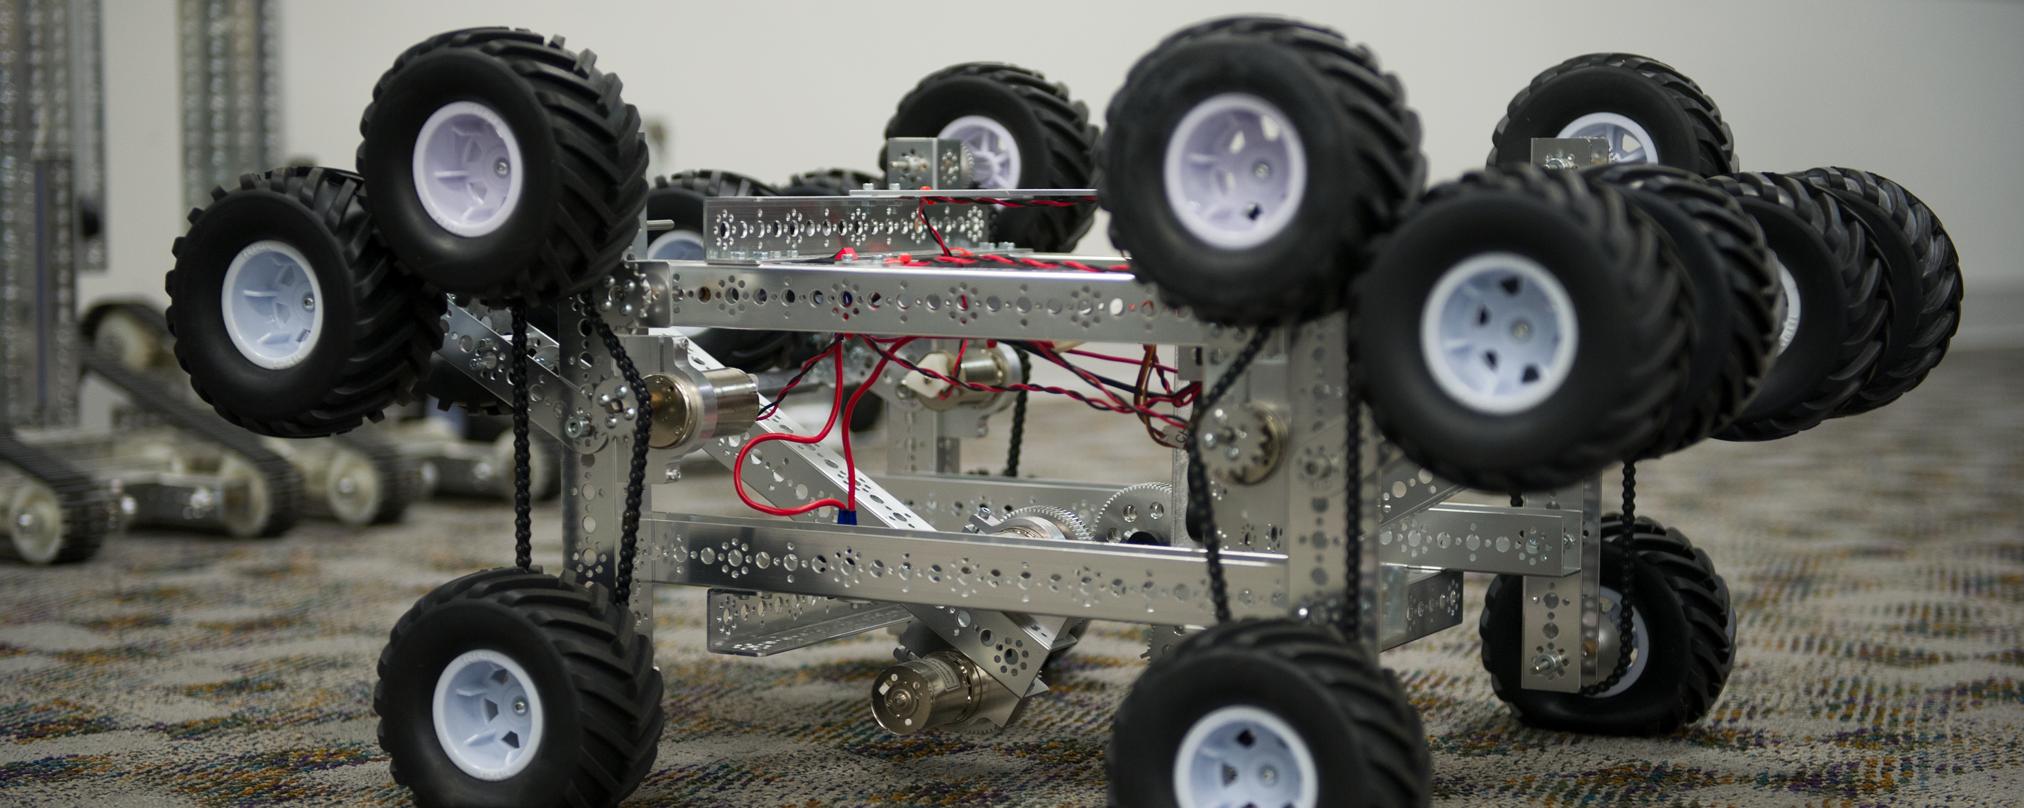 Robot-Inspiration-2024-0418